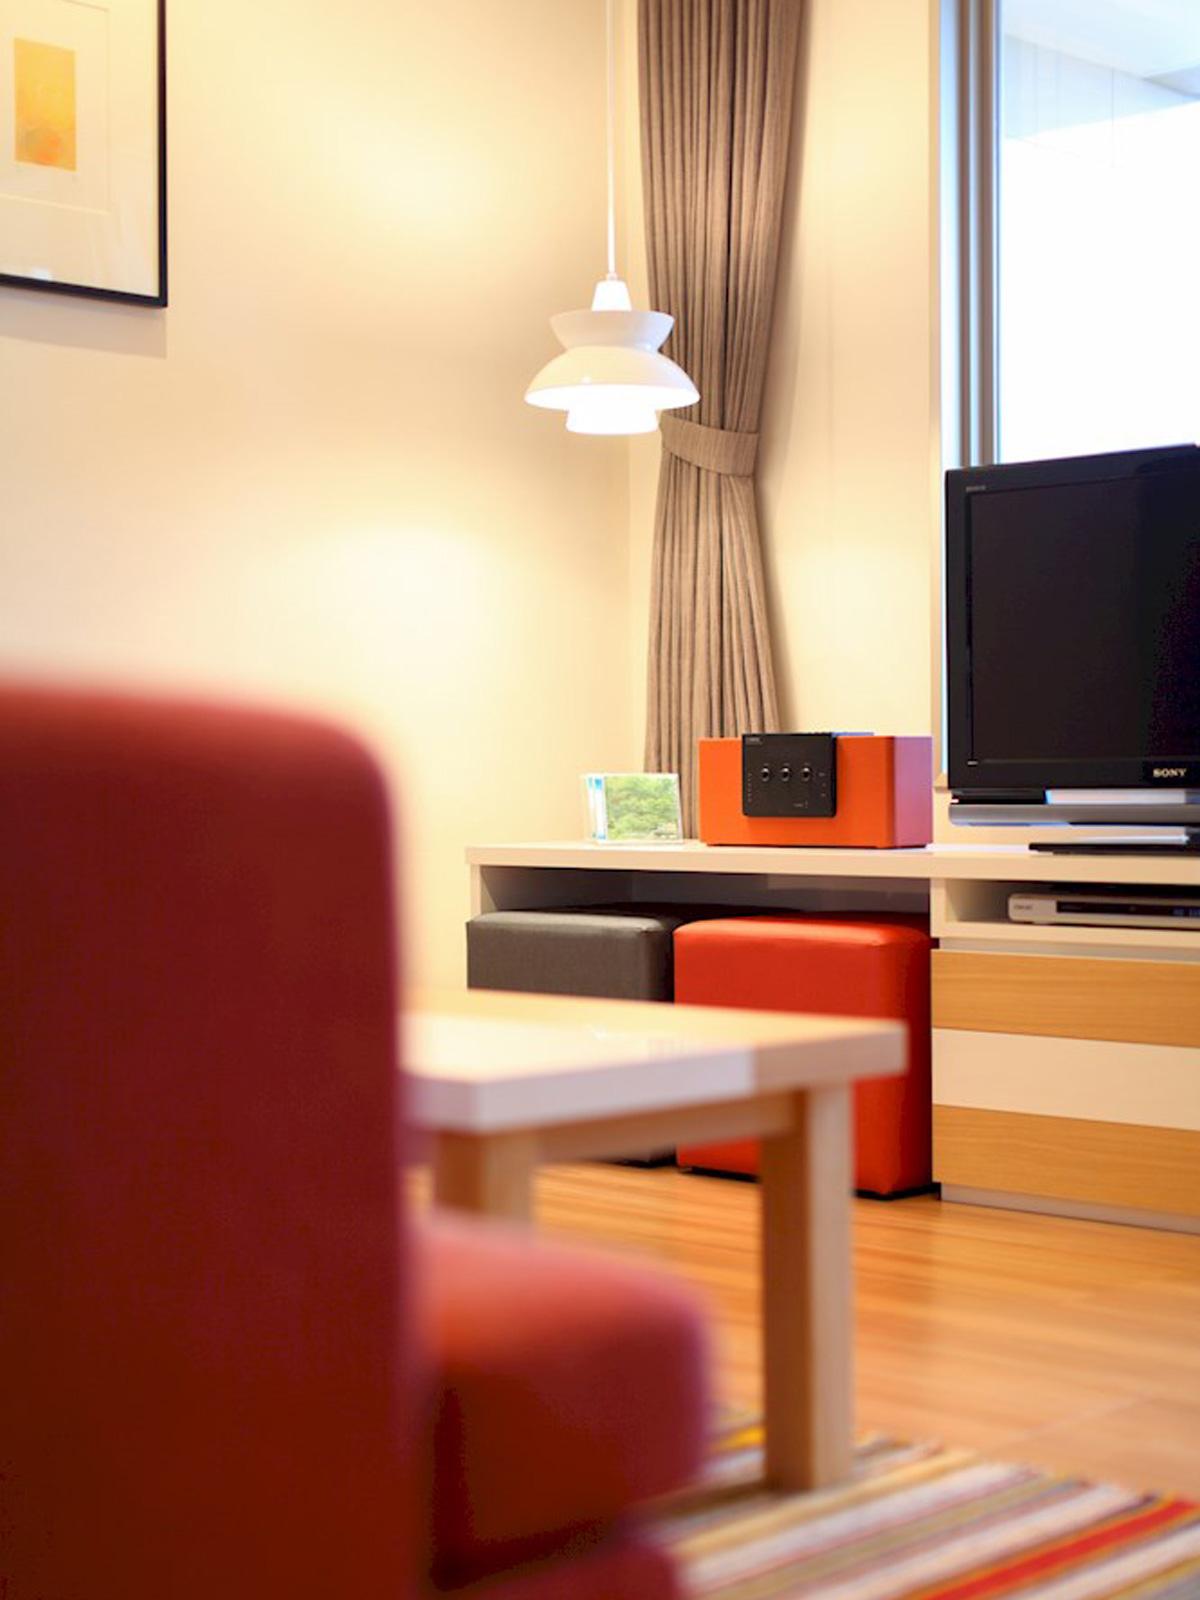 doo wop lampen leuchten designerleuchten online berlin design. Black Bedroom Furniture Sets. Home Design Ideas